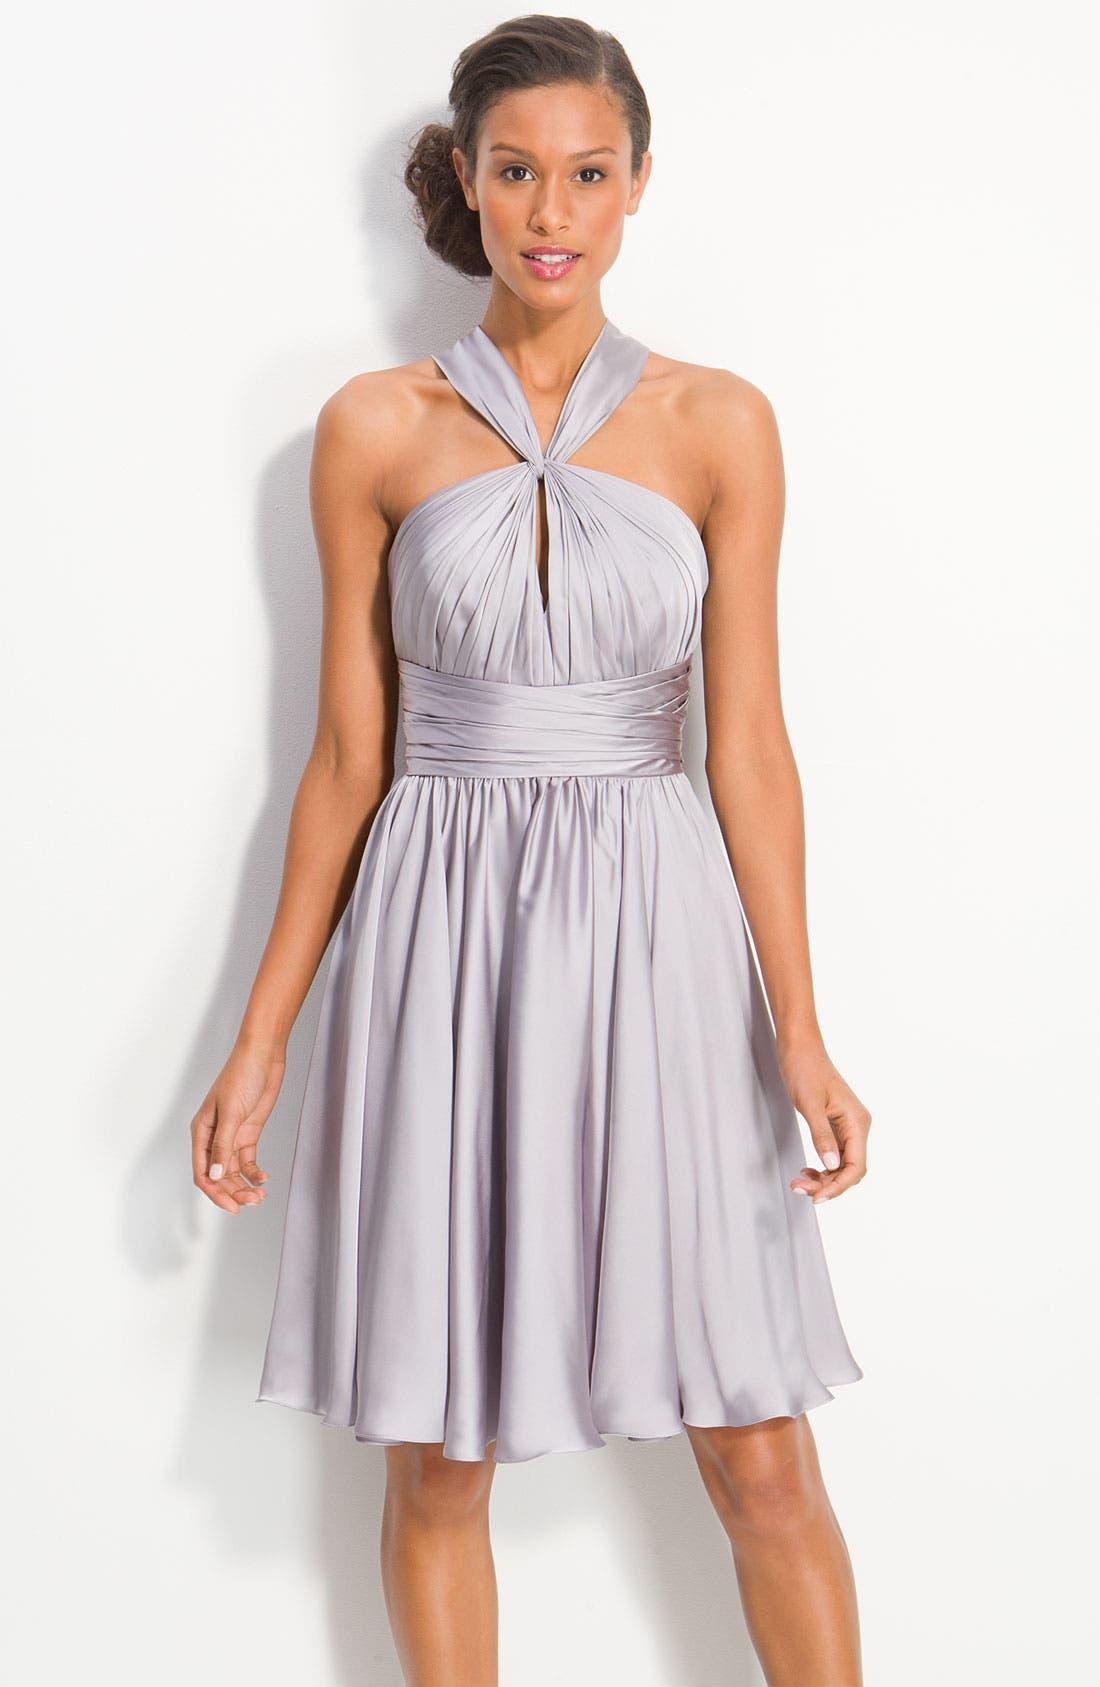 Alternate Image 1 Selected - ML Monique Lhuillier Bridesmaids Twist Front Charmeuse Dress (Nordstrom Exclusive)